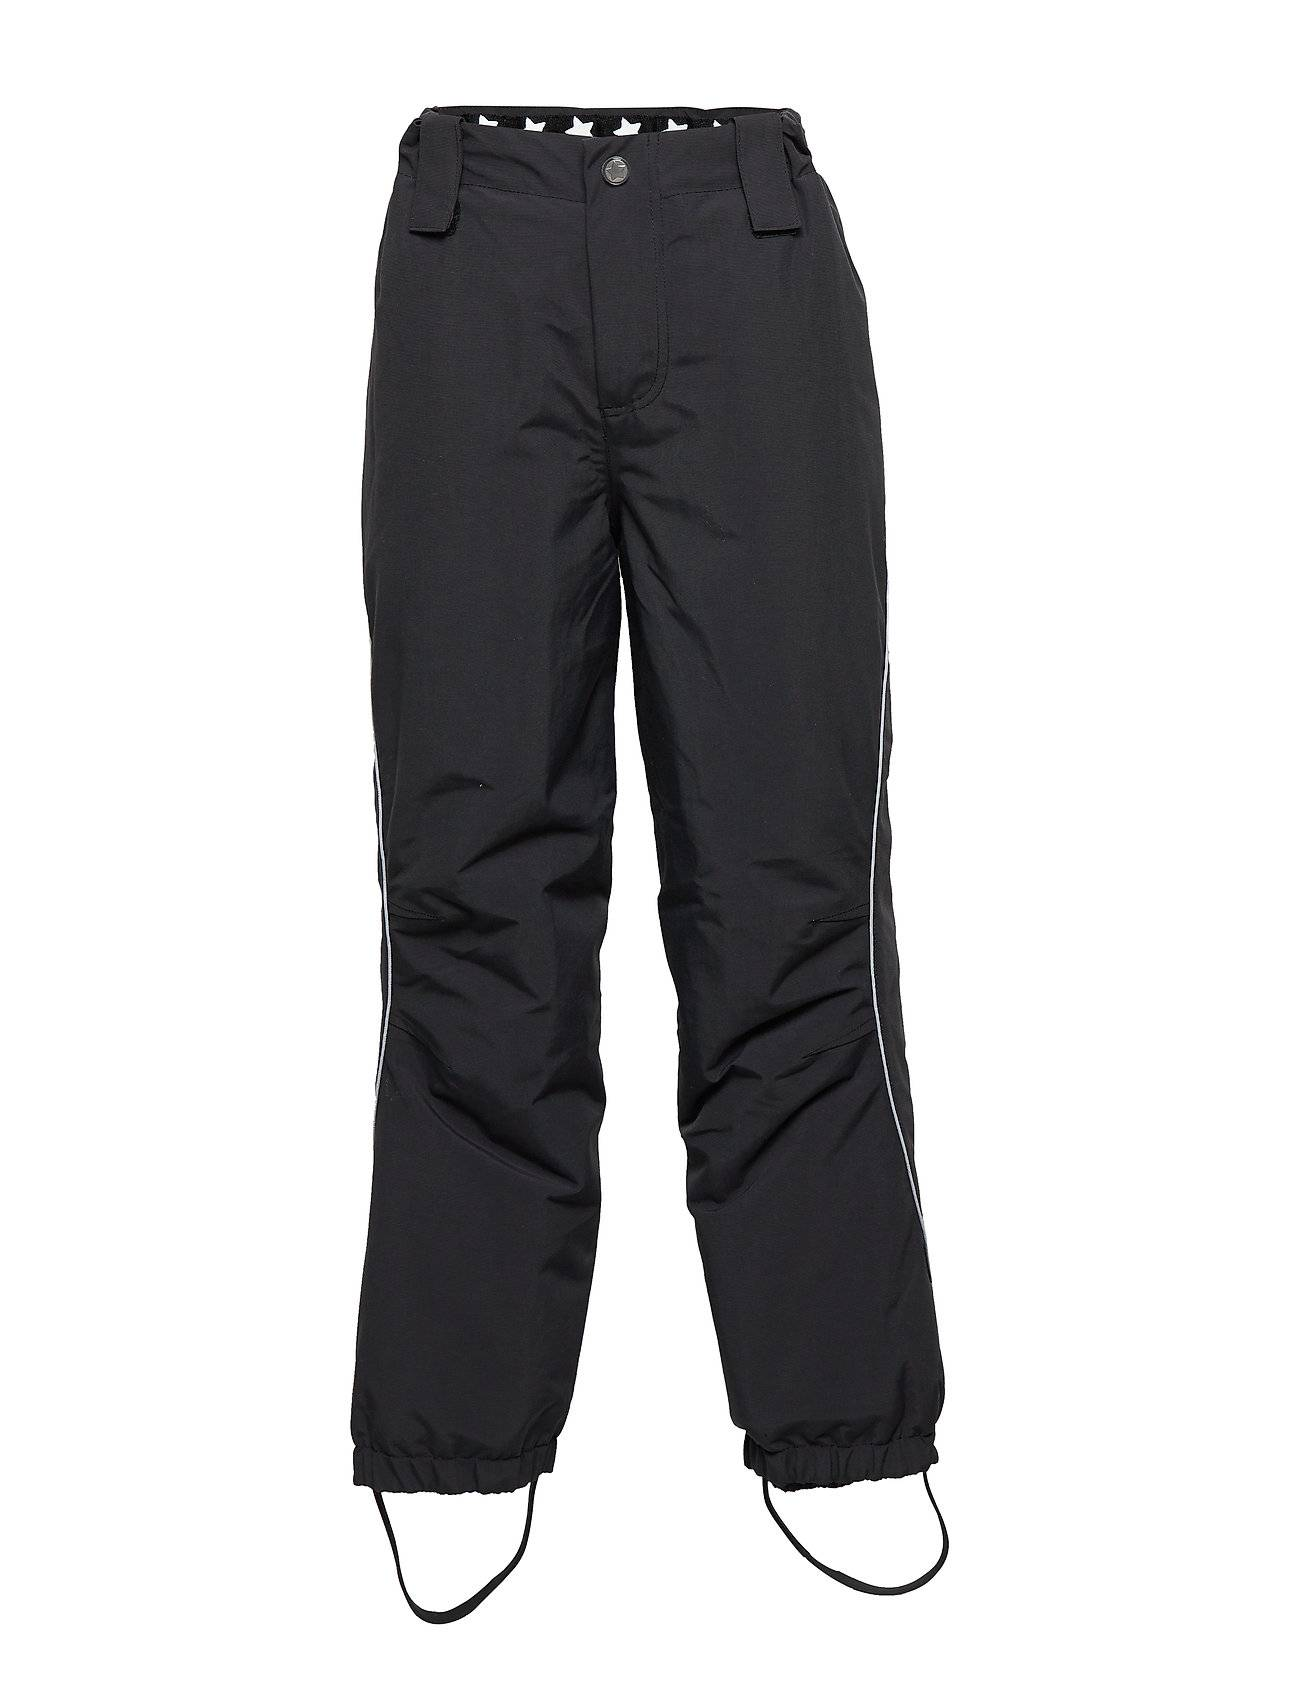 Molo Pollux Active Outerwear Snow/ski Clothing Snow/ski Pants Musta Molo